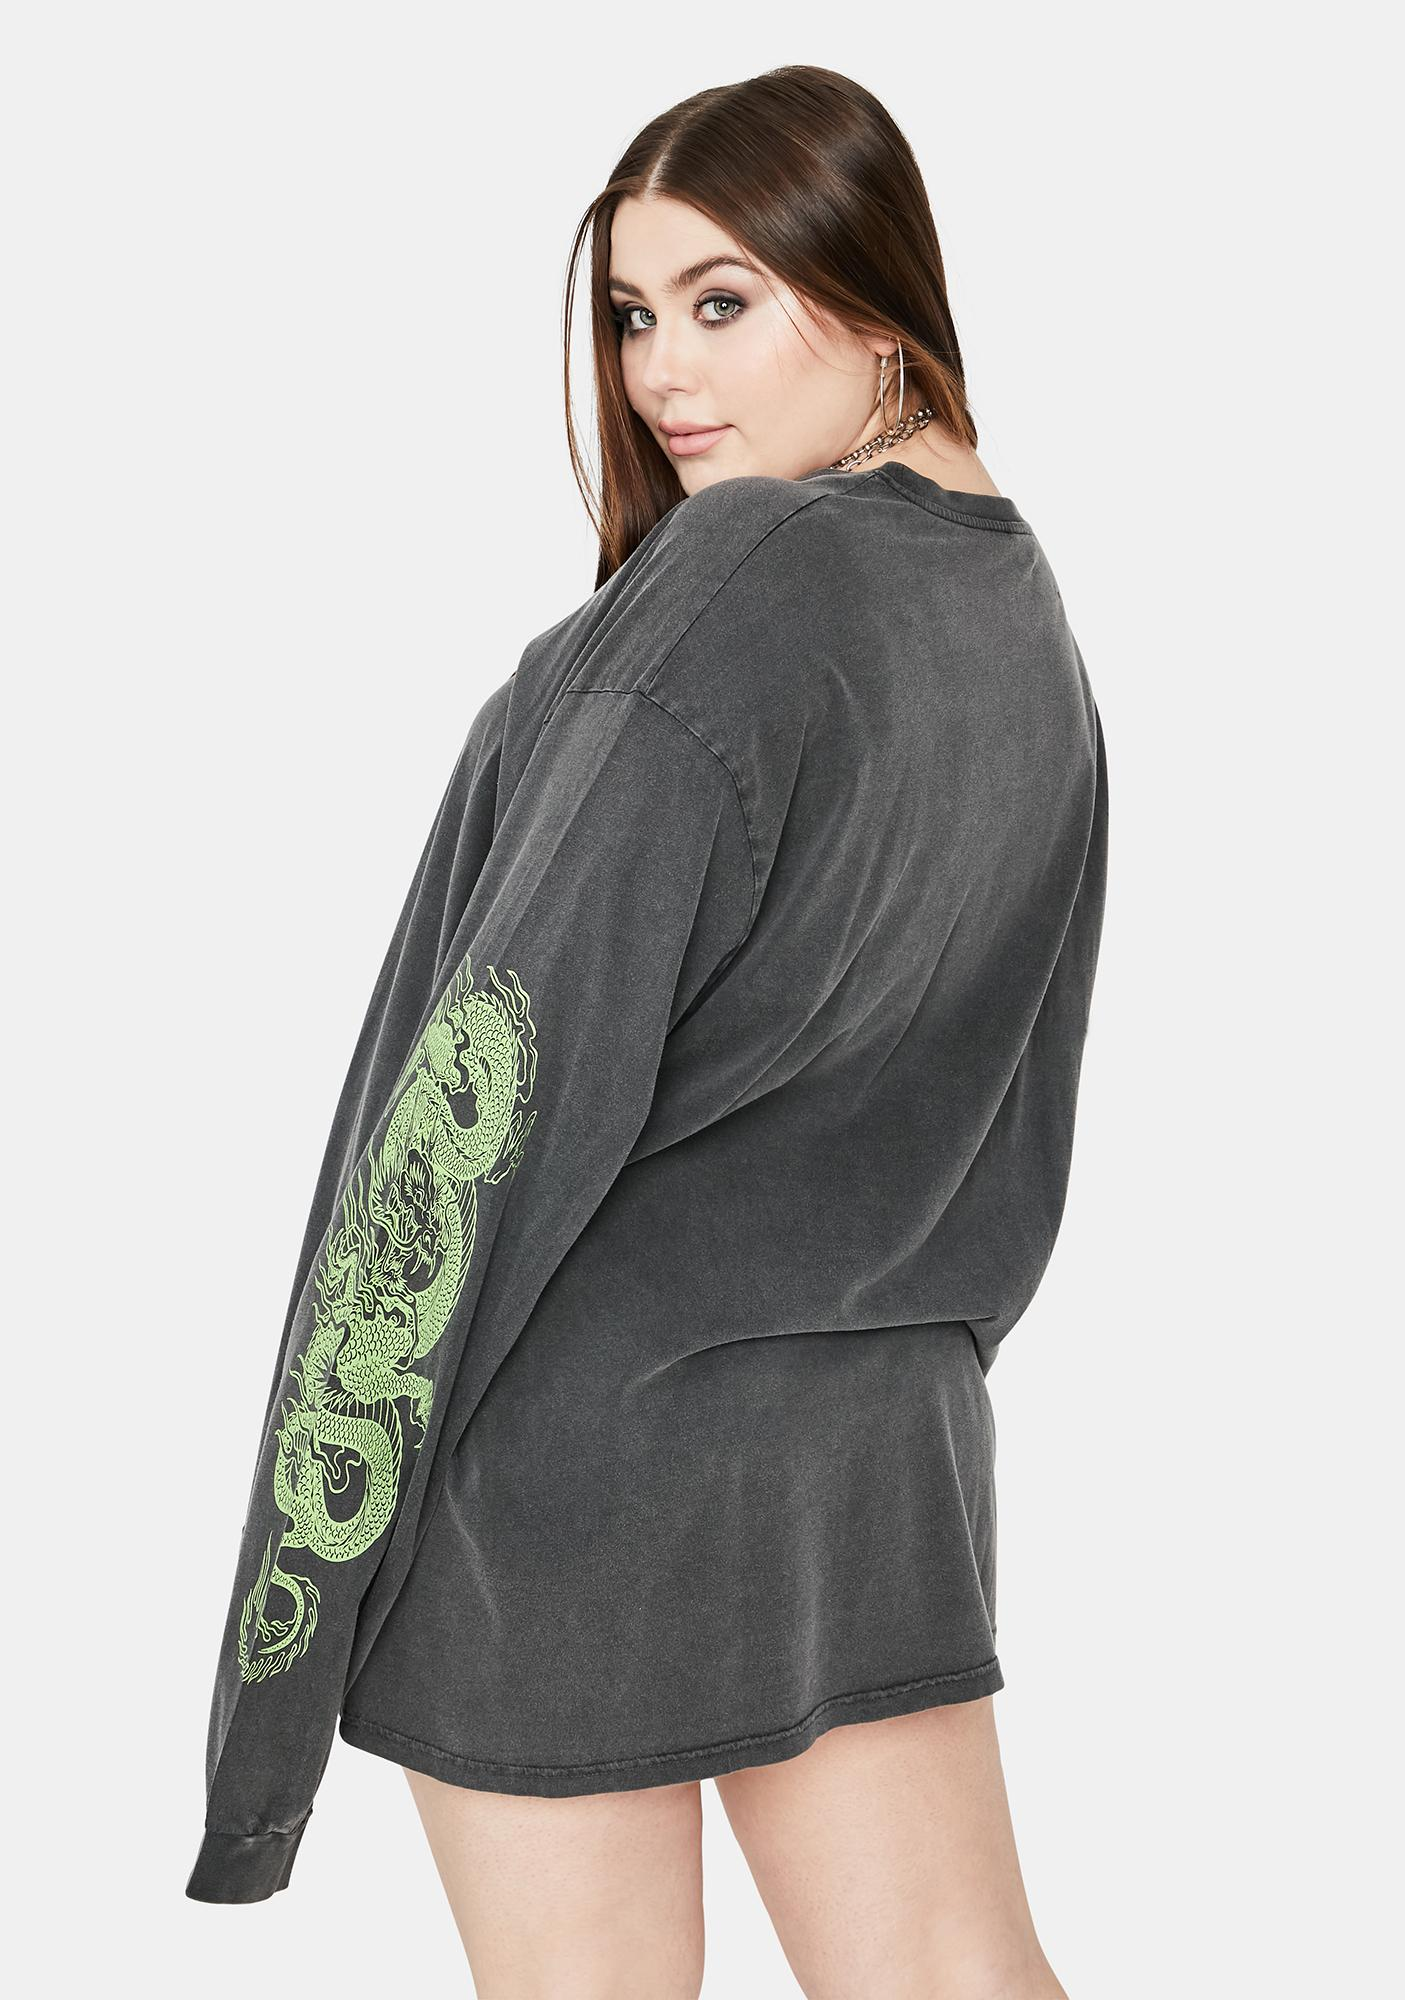 NEW GIRL ORDER Curve Triple Dragon Long Sleeve Tee